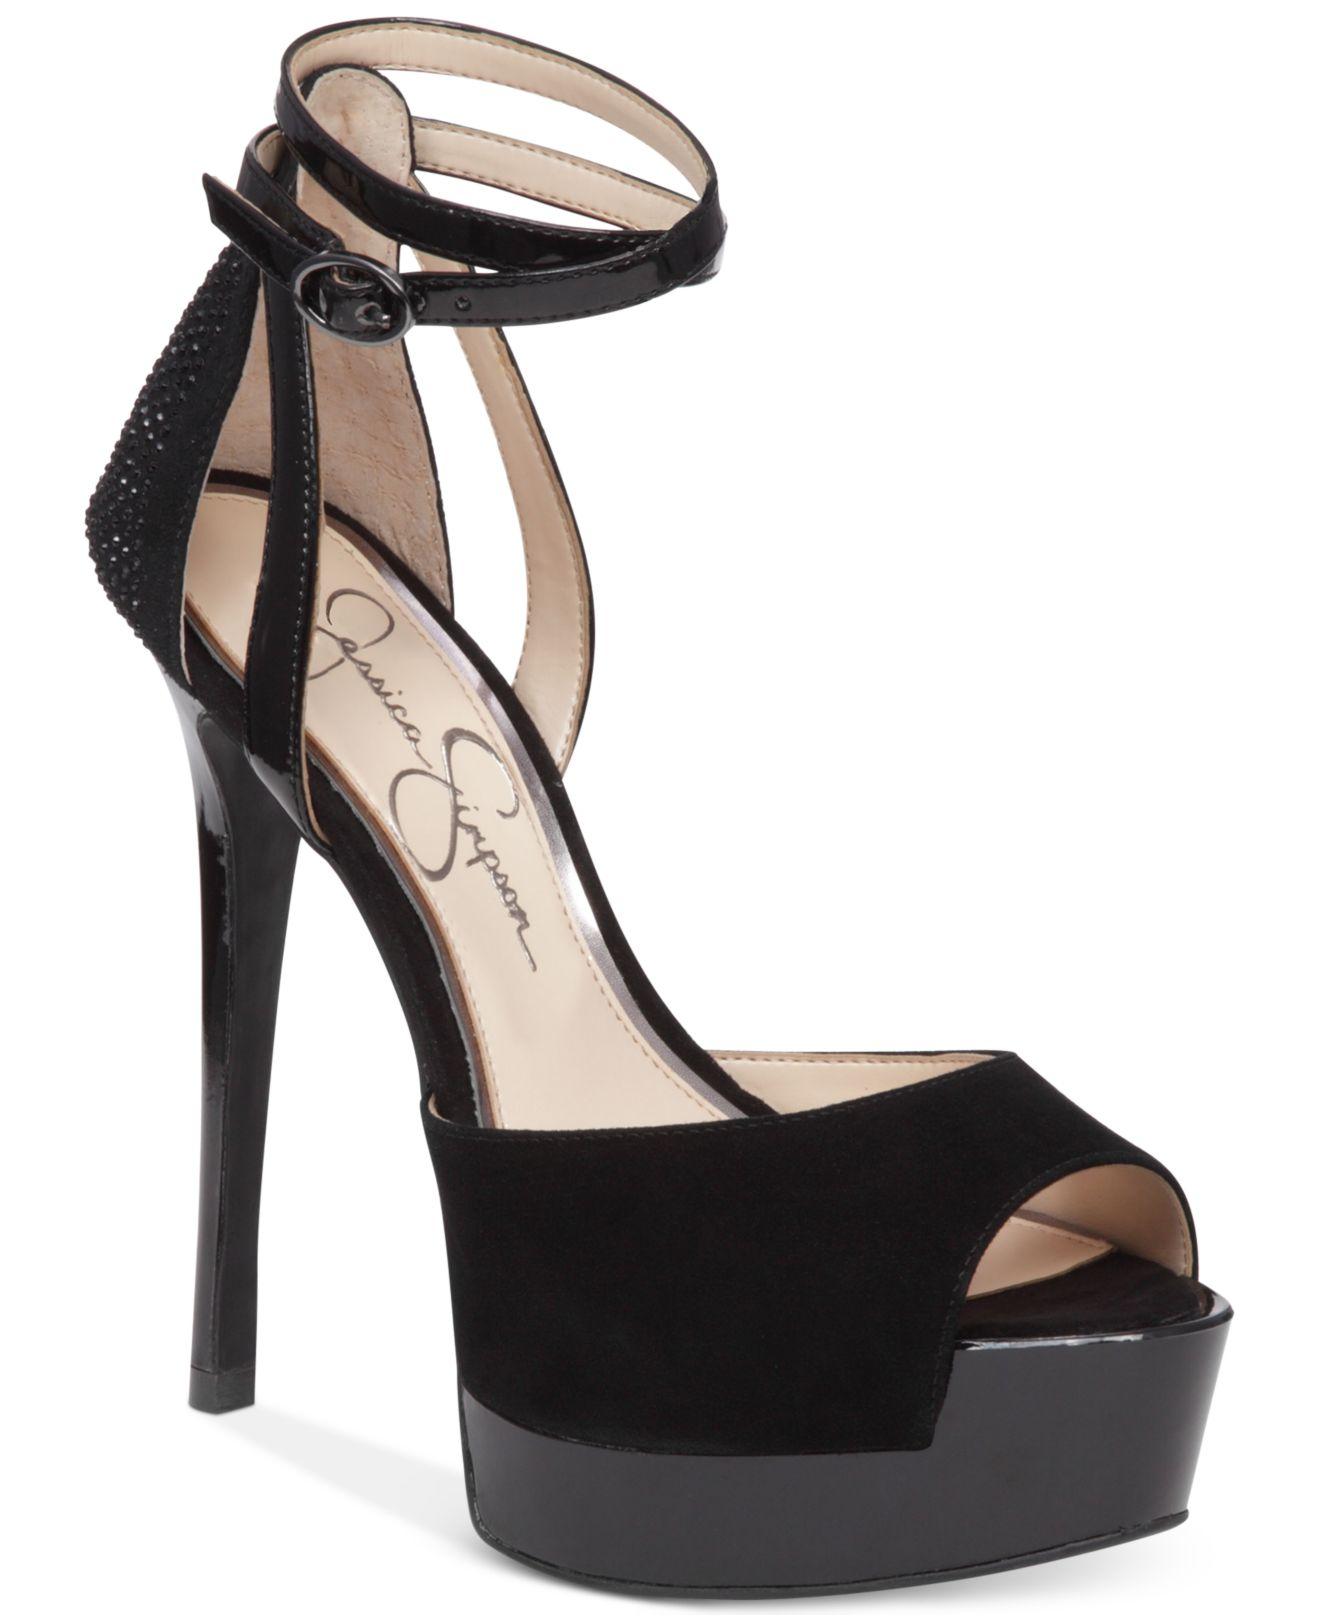 Jessica simpson Koen Ankle-strap Platform Pumps in Black | Lyst